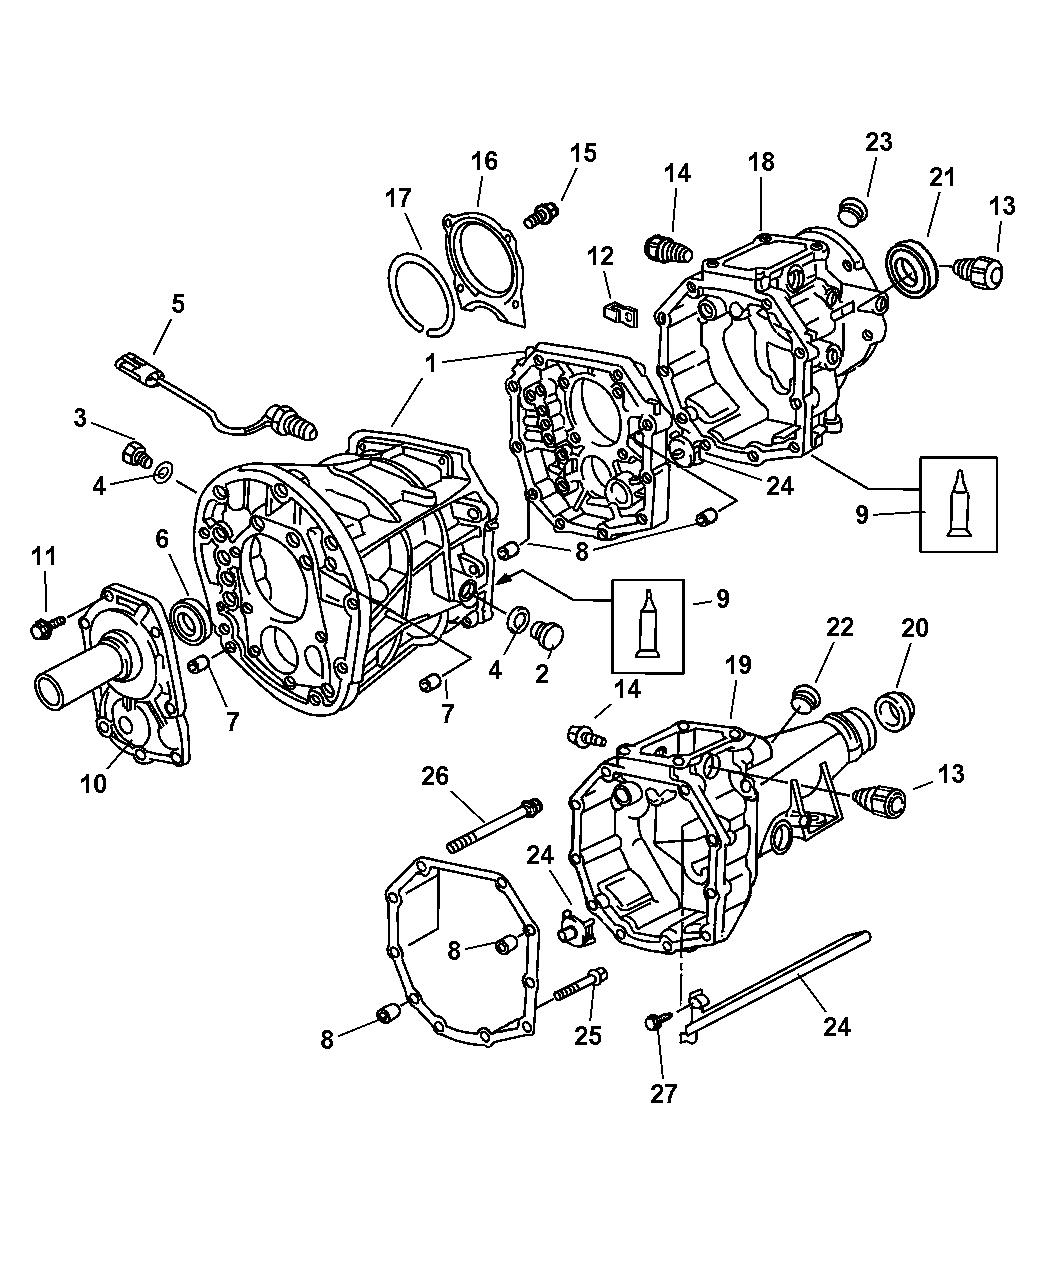 1998 Jeep Cherokee Alternator Wiring Diagram - Wiring Diagram